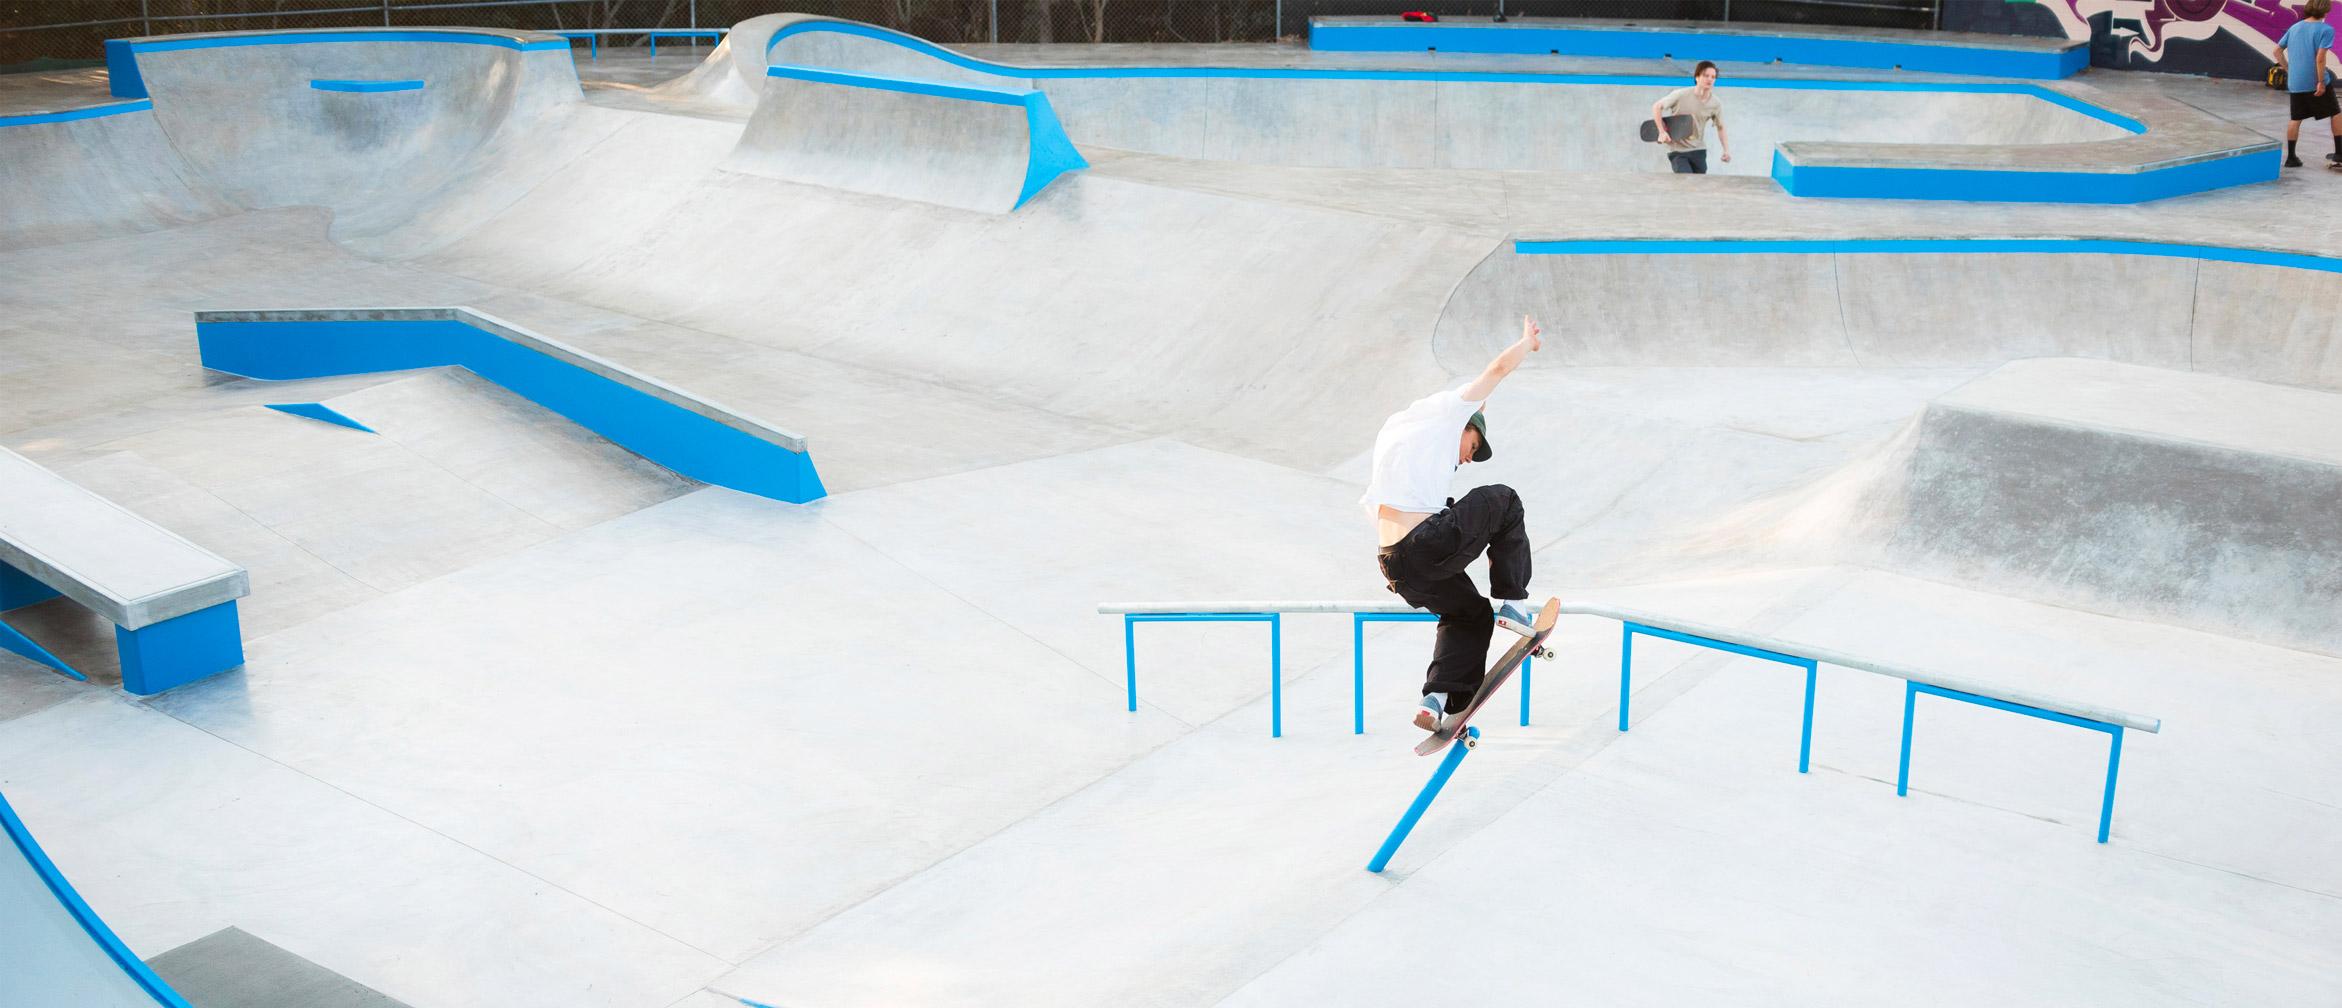 Matthew Boggis pole jam backside smith at Sunshine Beach new skate park